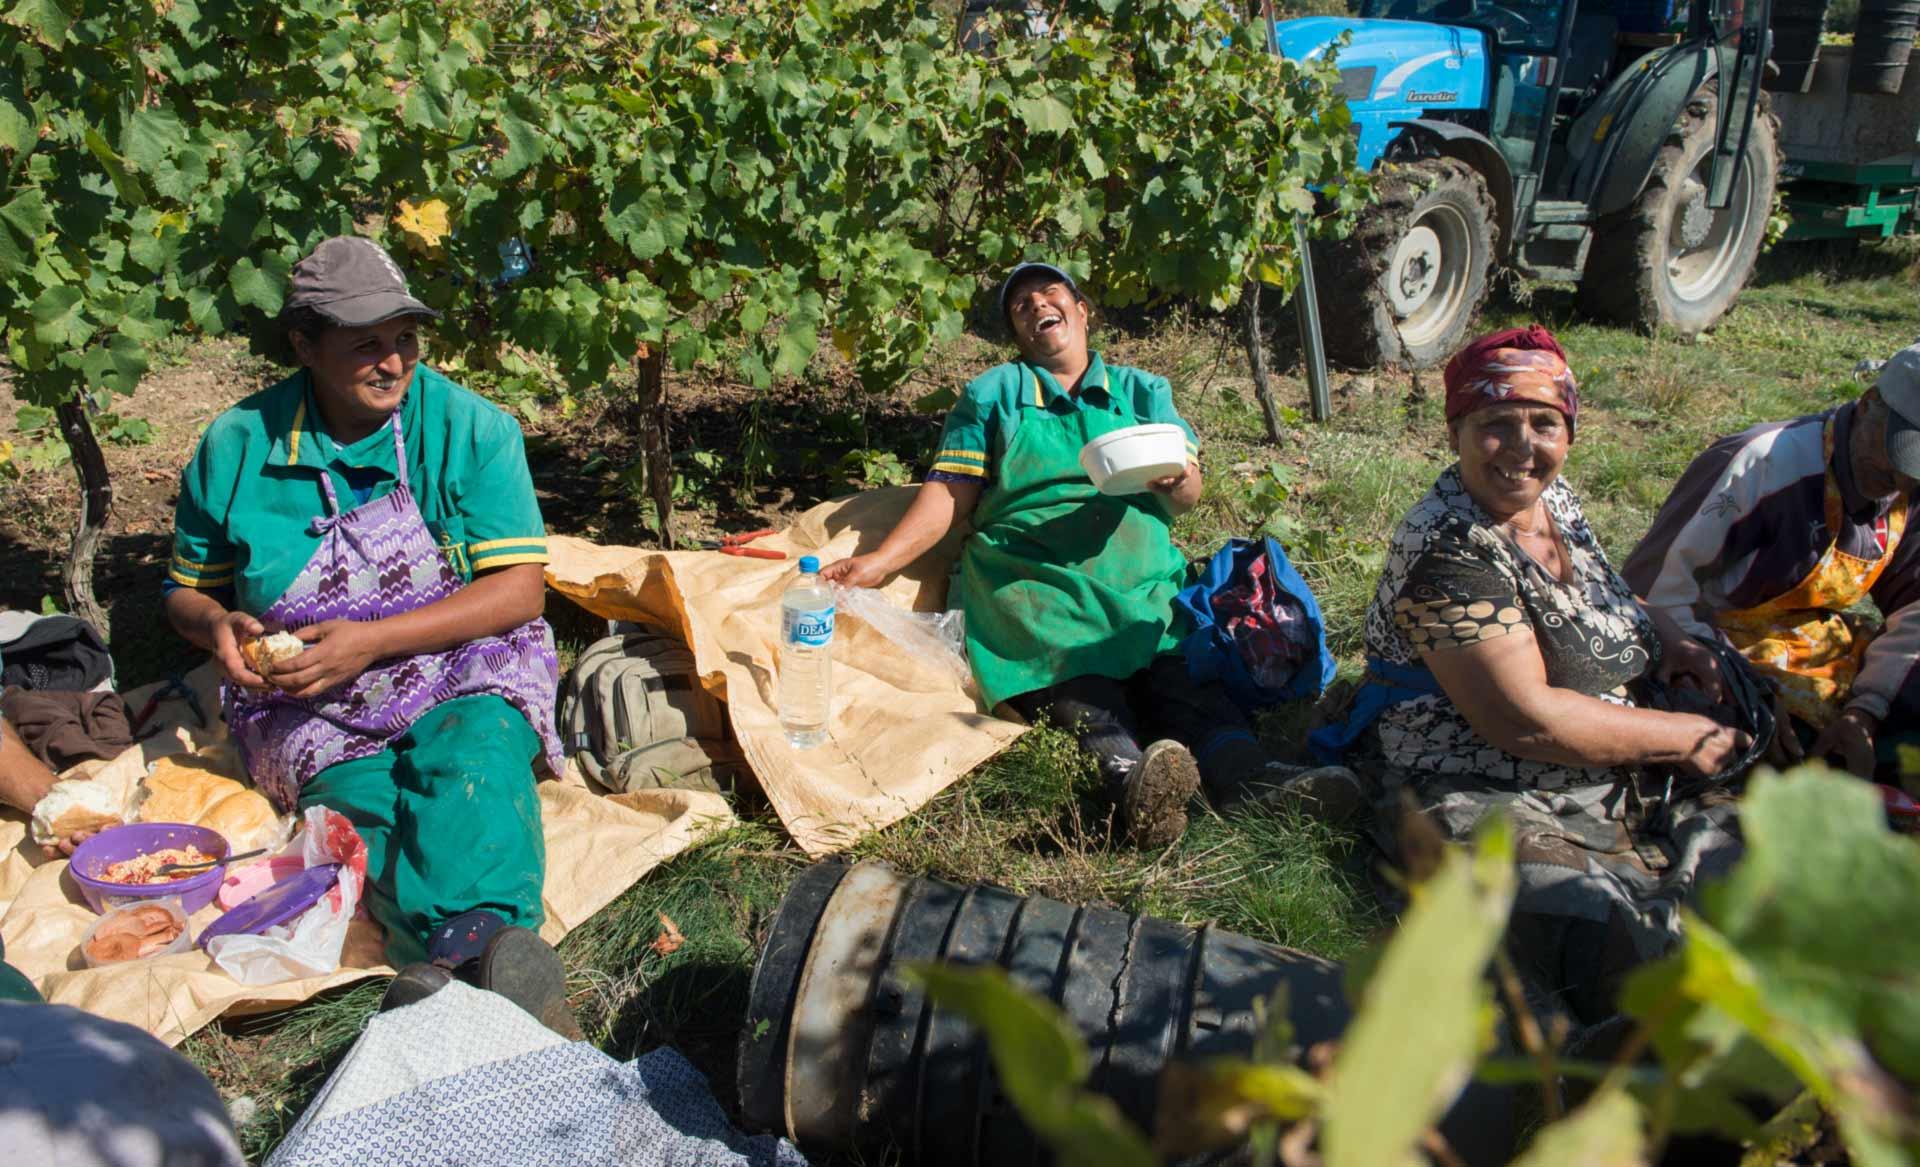 rastar under vinproduktion